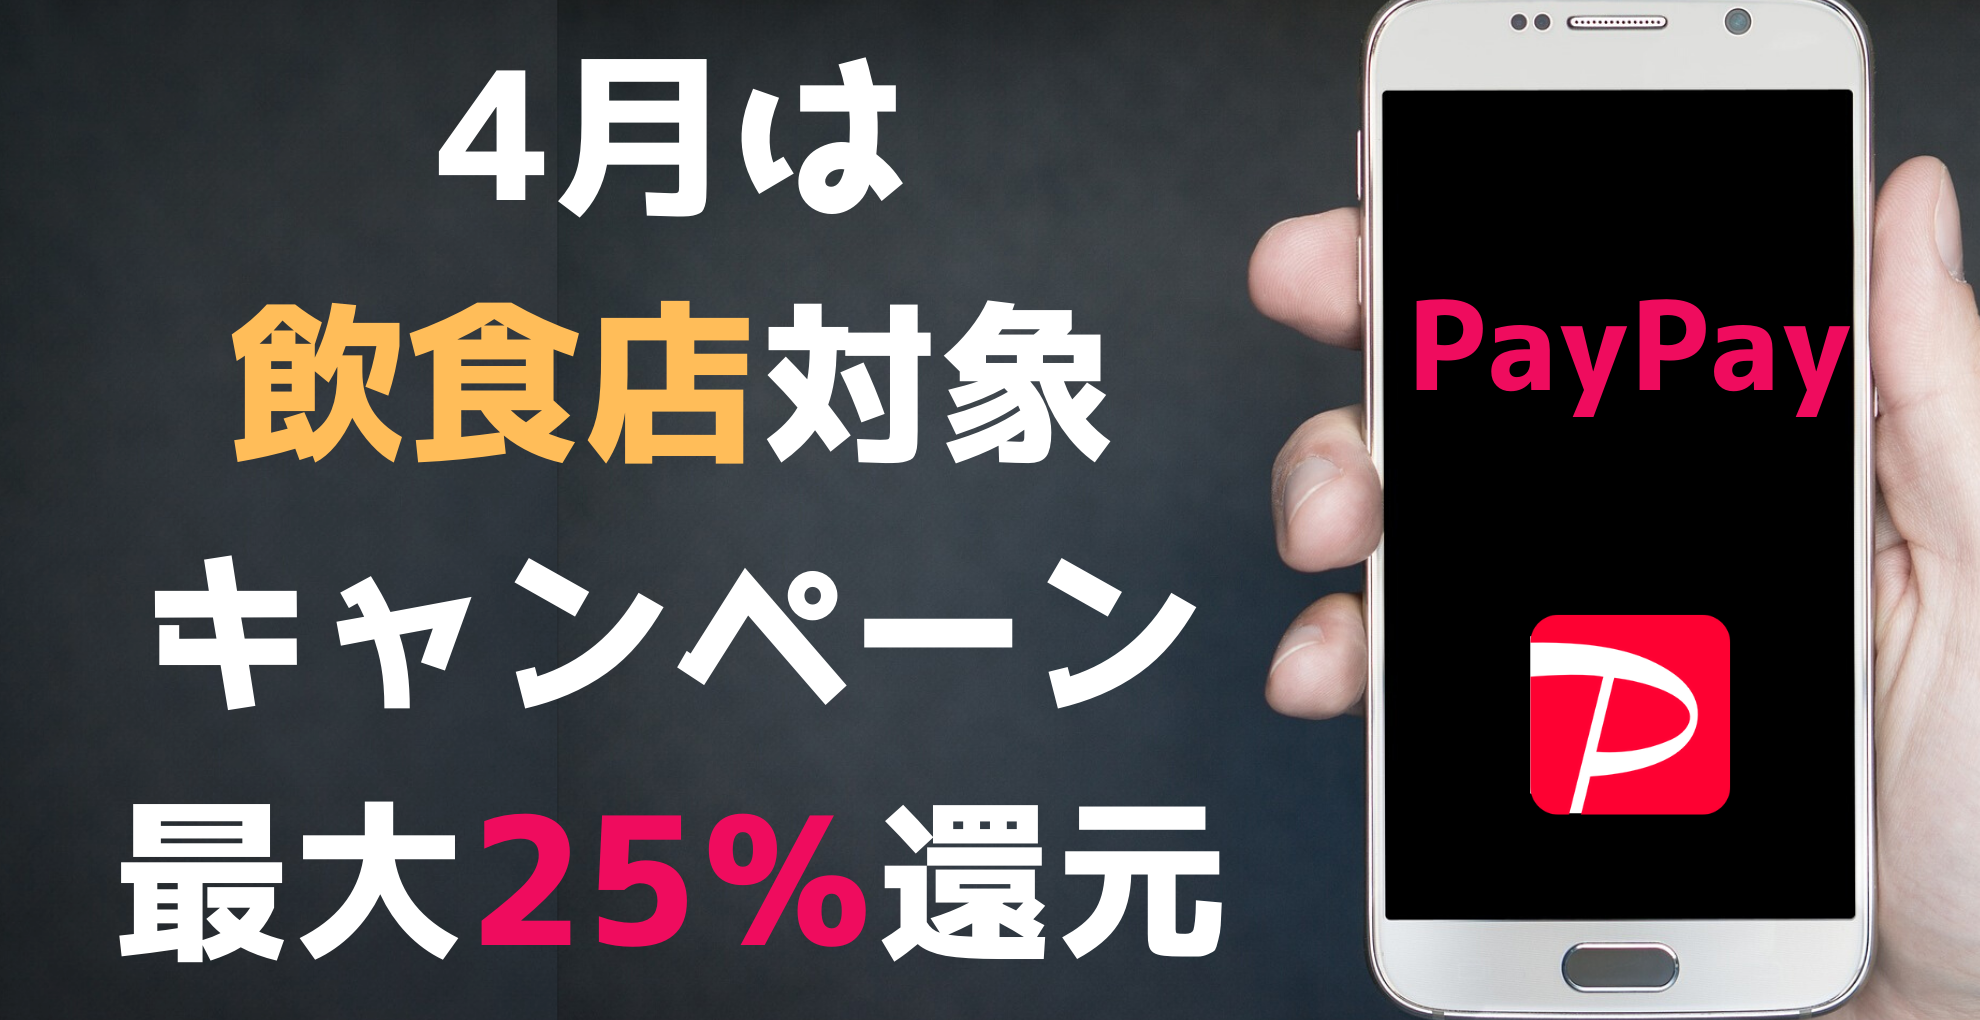 【PayPay】4月は飲食店対象のキャンペーン 最大25%還元